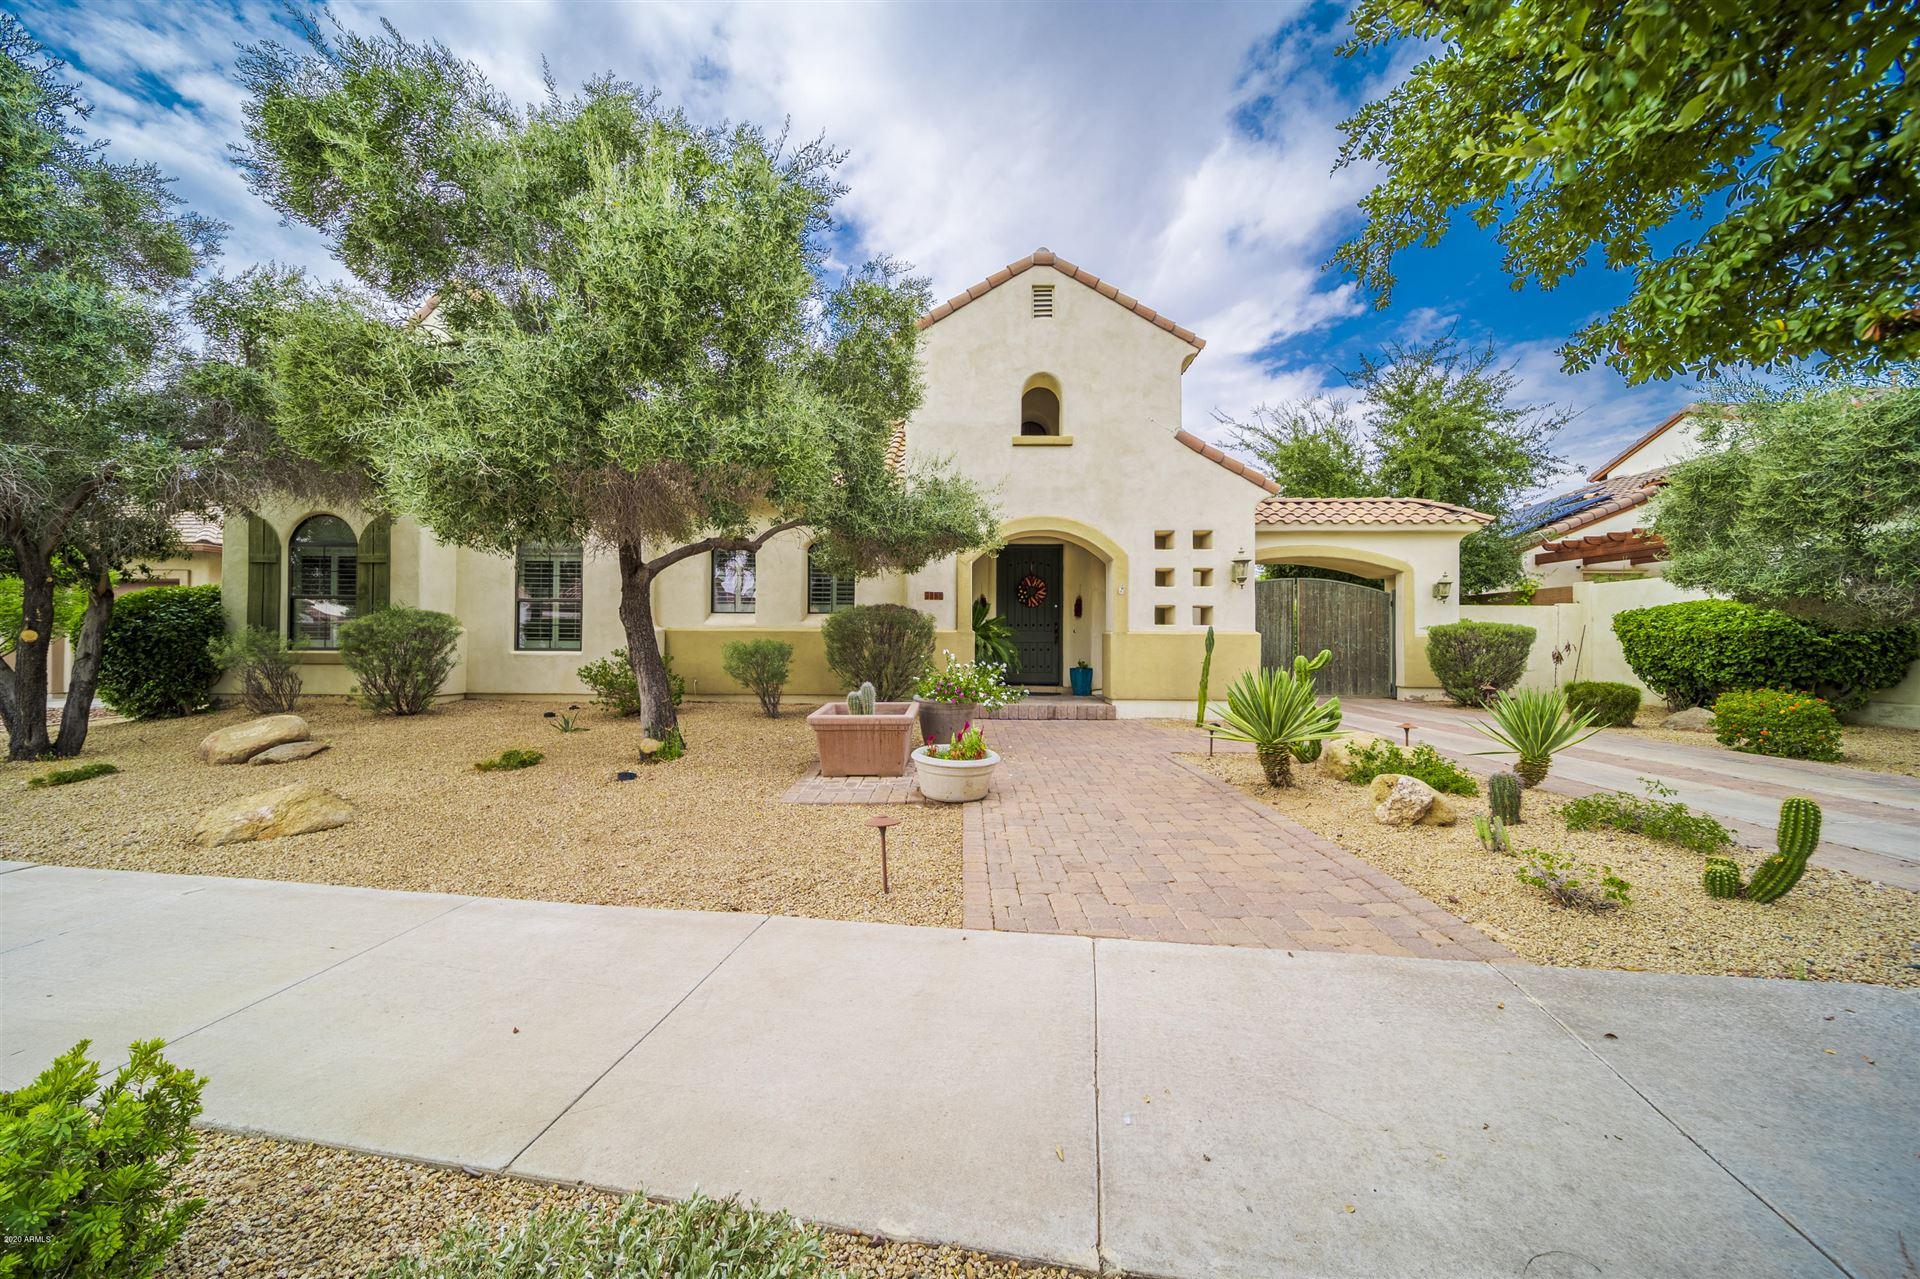 218 N ALEPPO Court, Litchfield Park, AZ 85340 - MLS#: 6136022